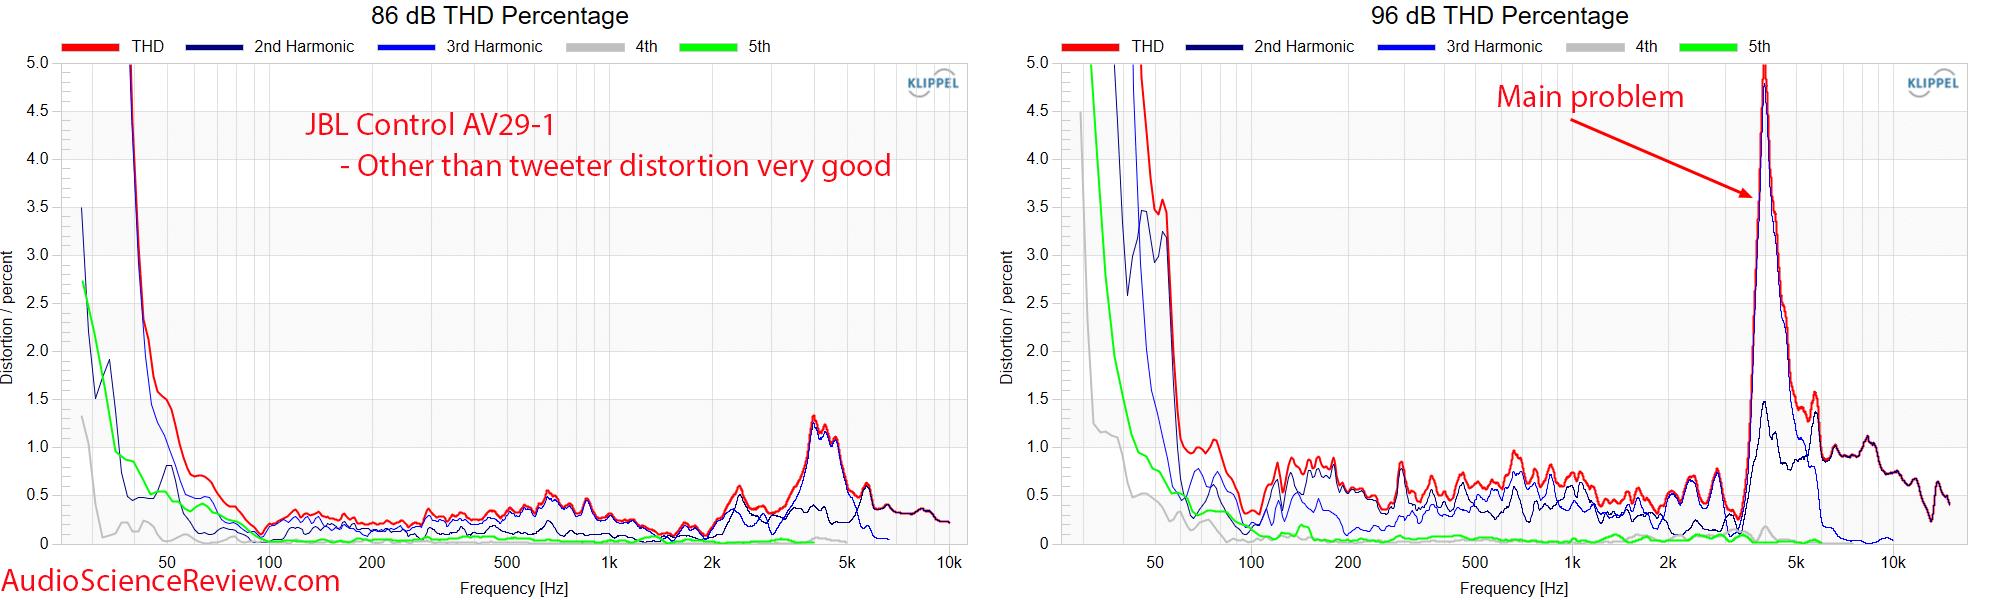 JBL Control 29AV-1 Measurements distortion vs frequency response Outdoor PA Speaker.png